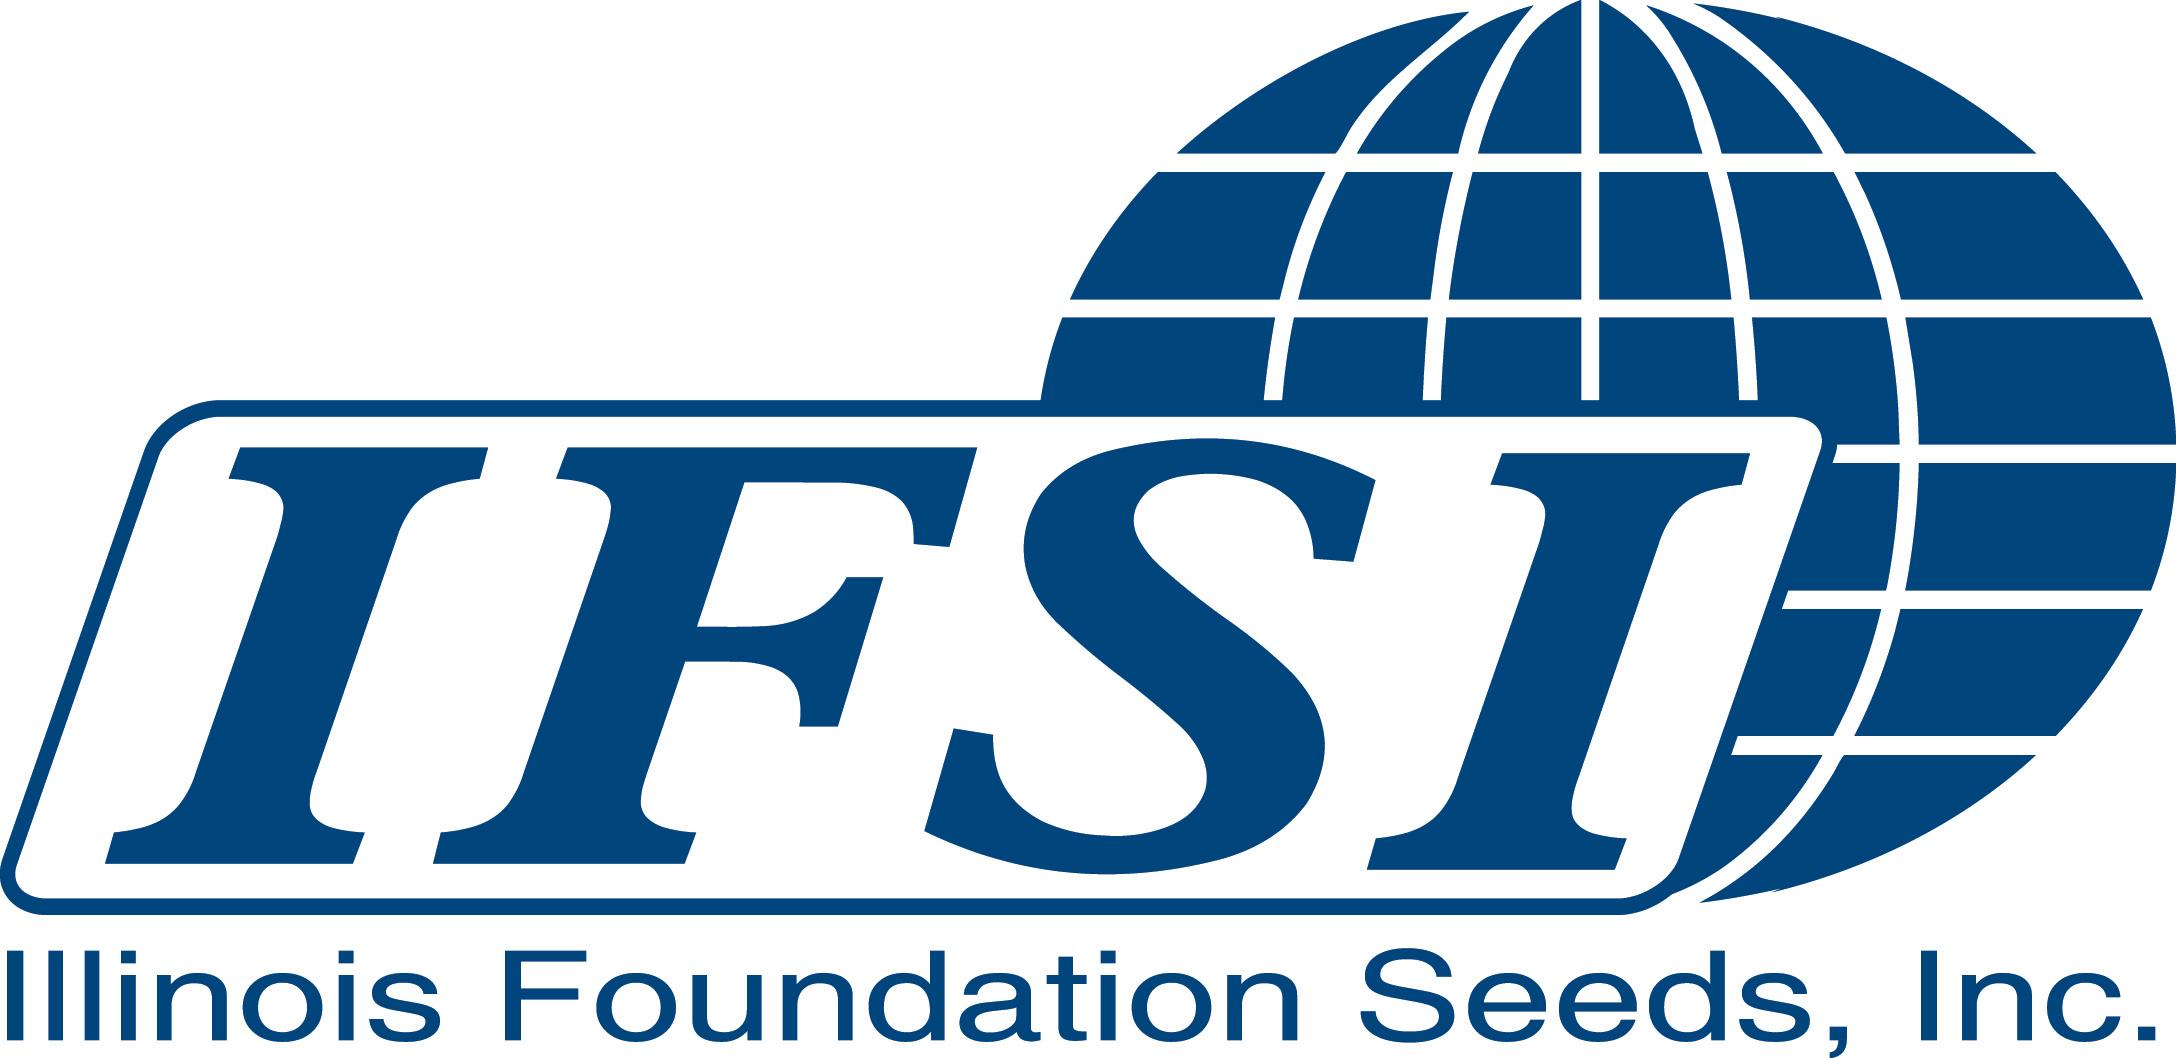 IFS - Illinois Foundation Seeds, Inc.